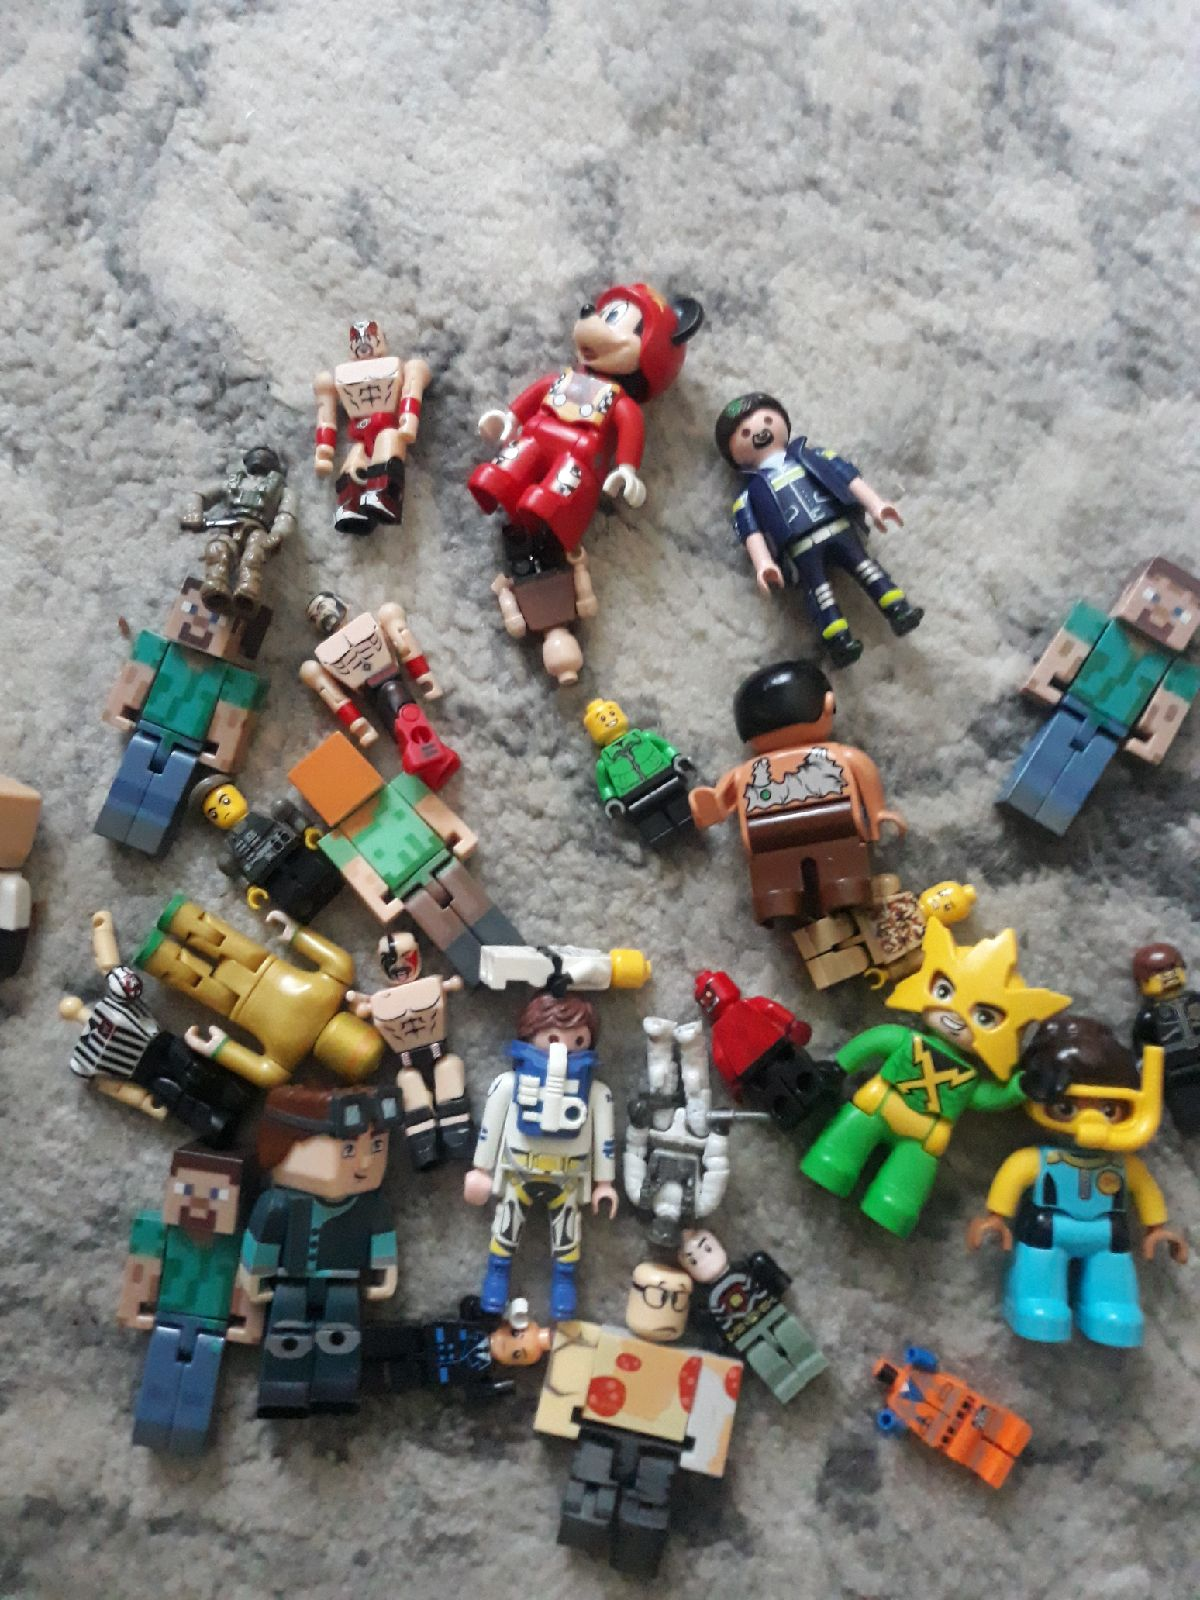 Bundle of legos